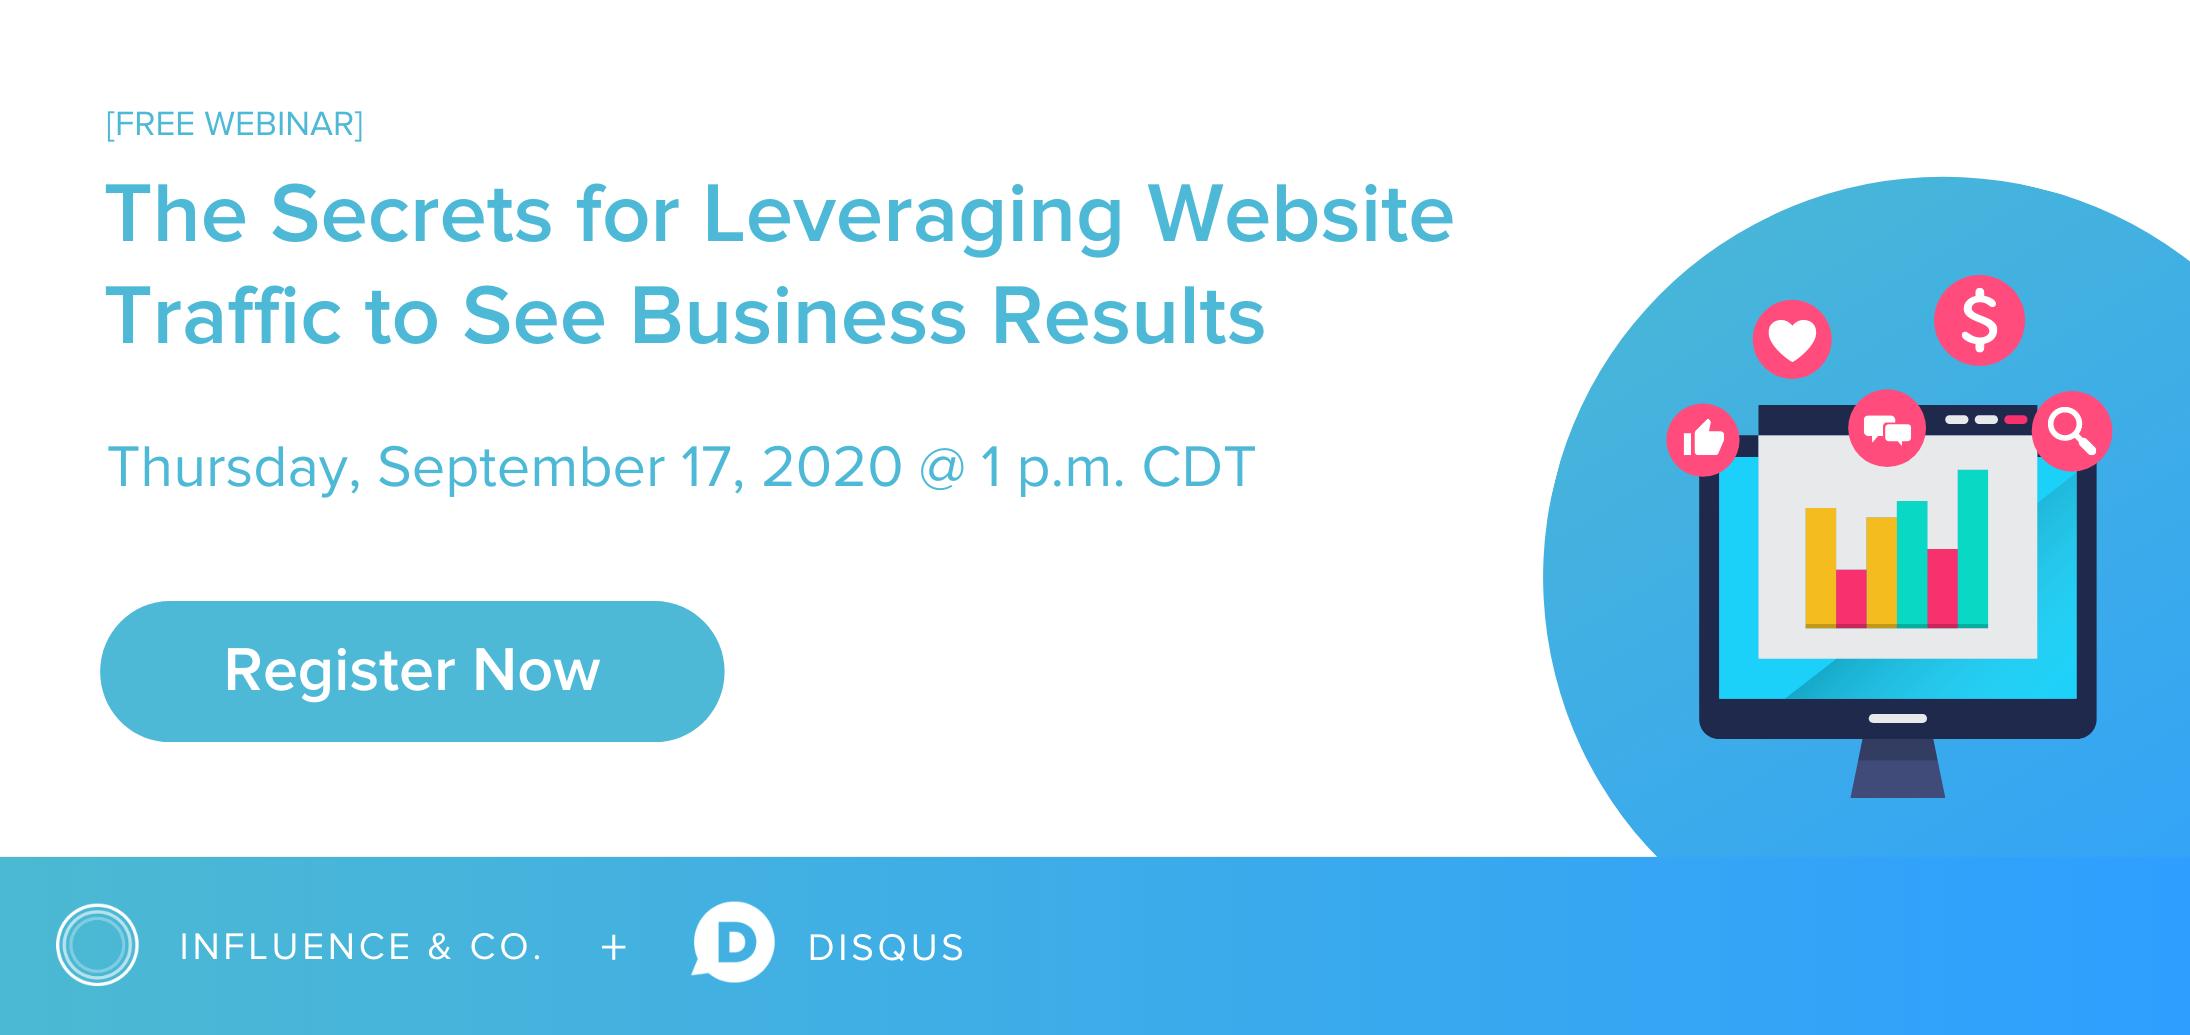 Register for Webinar: The Secrets for Leveraging Website Traffic to See Business Results